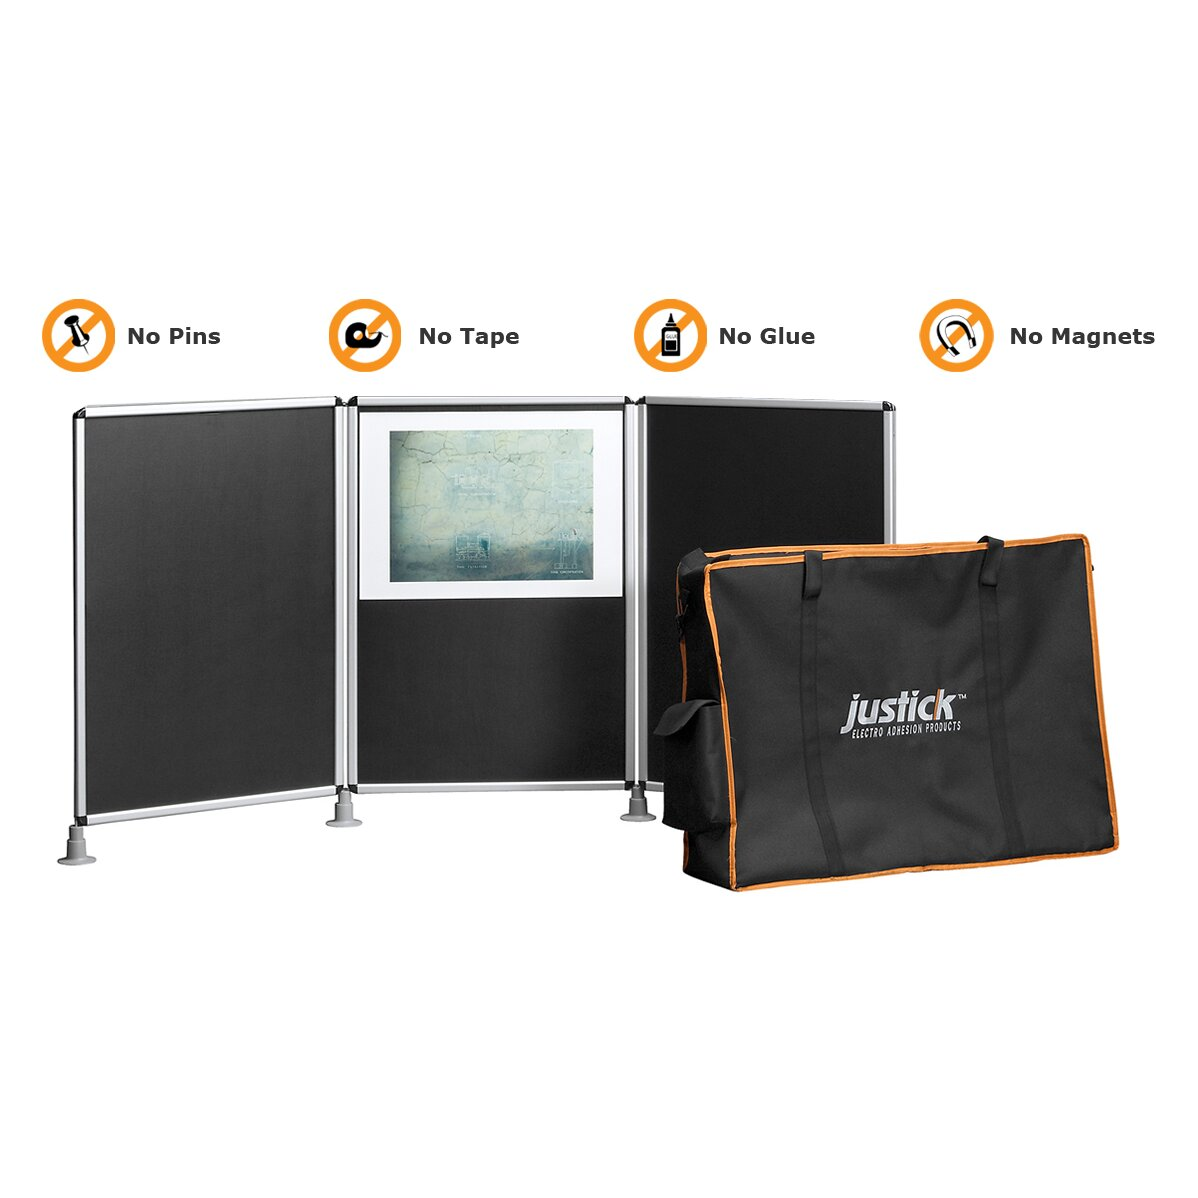 Justick Electro Adhesion 3 Panel Table Top Expo Display Bulletin Board